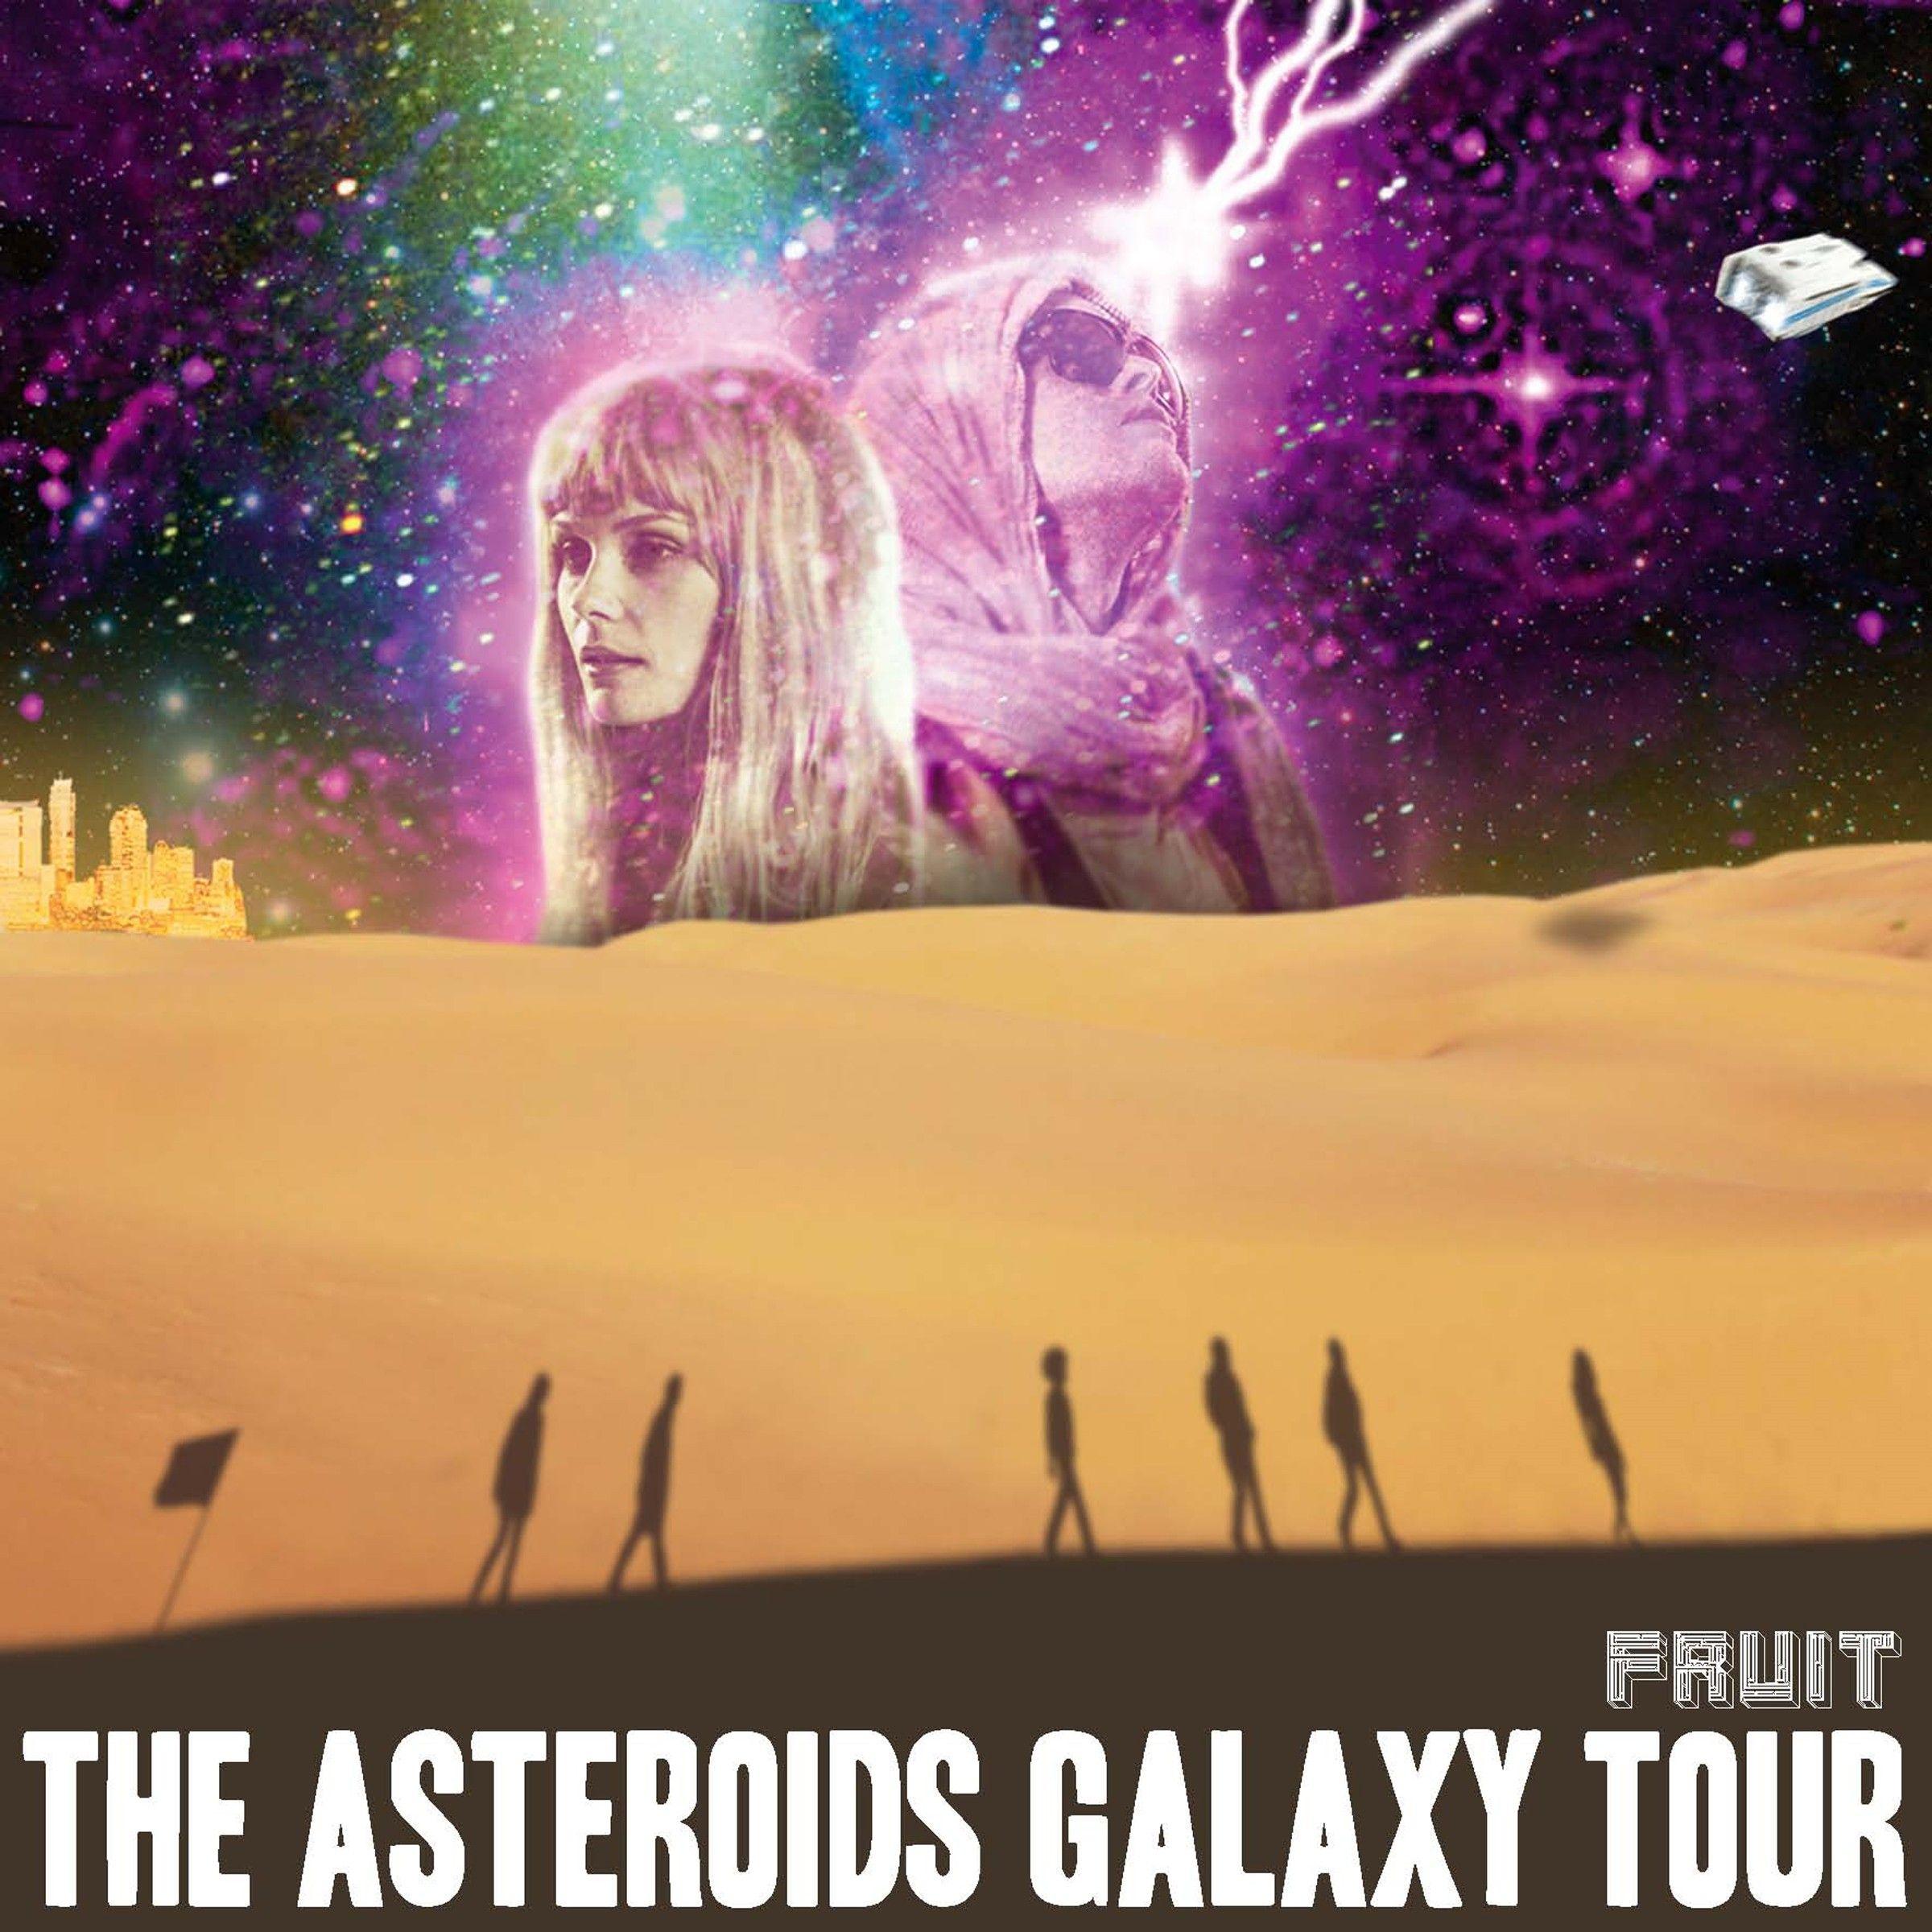 The Asteroids Galaxy Tour - Fruit album cover